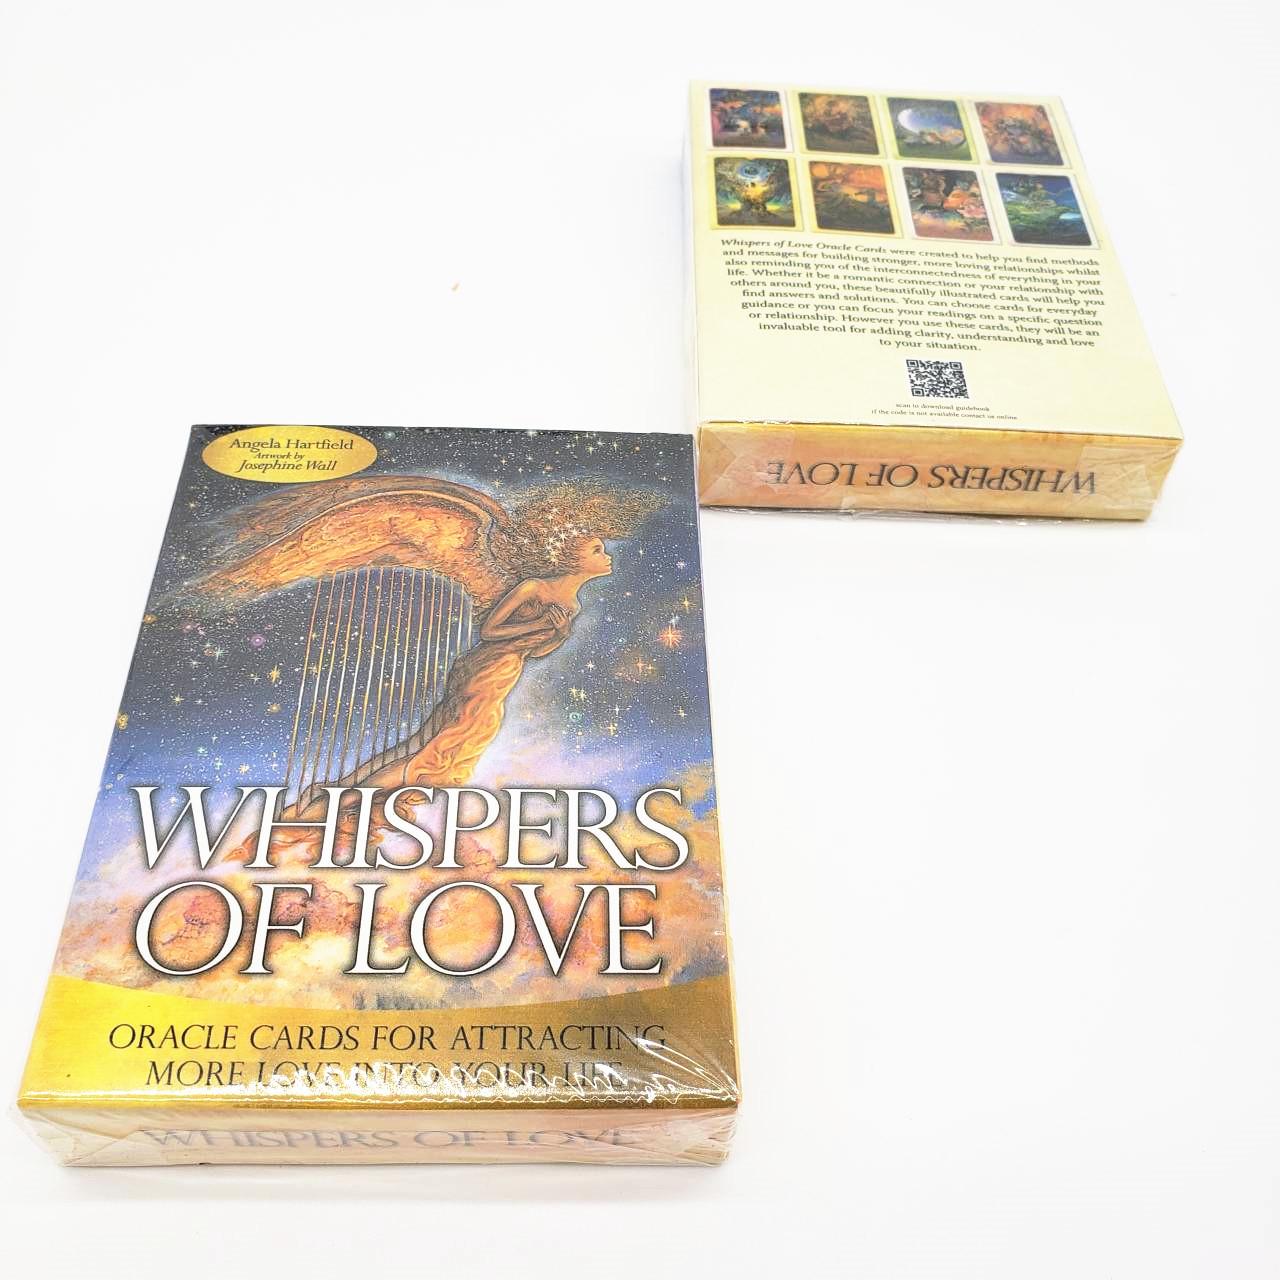 Bộ Bài Bói Tarot Whispers of Love Oracle Cards New Cao Cấp